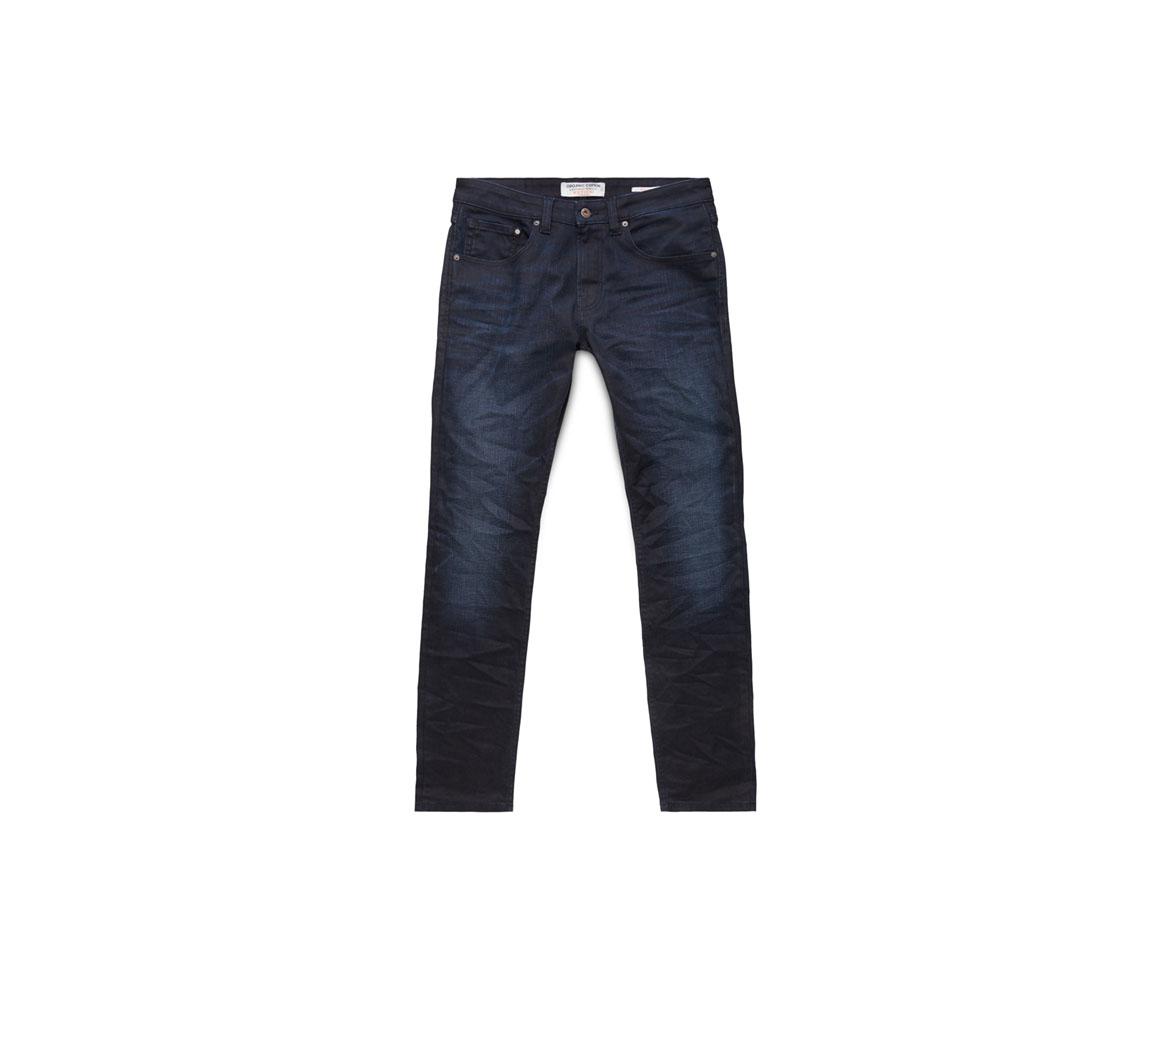 Vêtement homme Jeans Kale Skinny